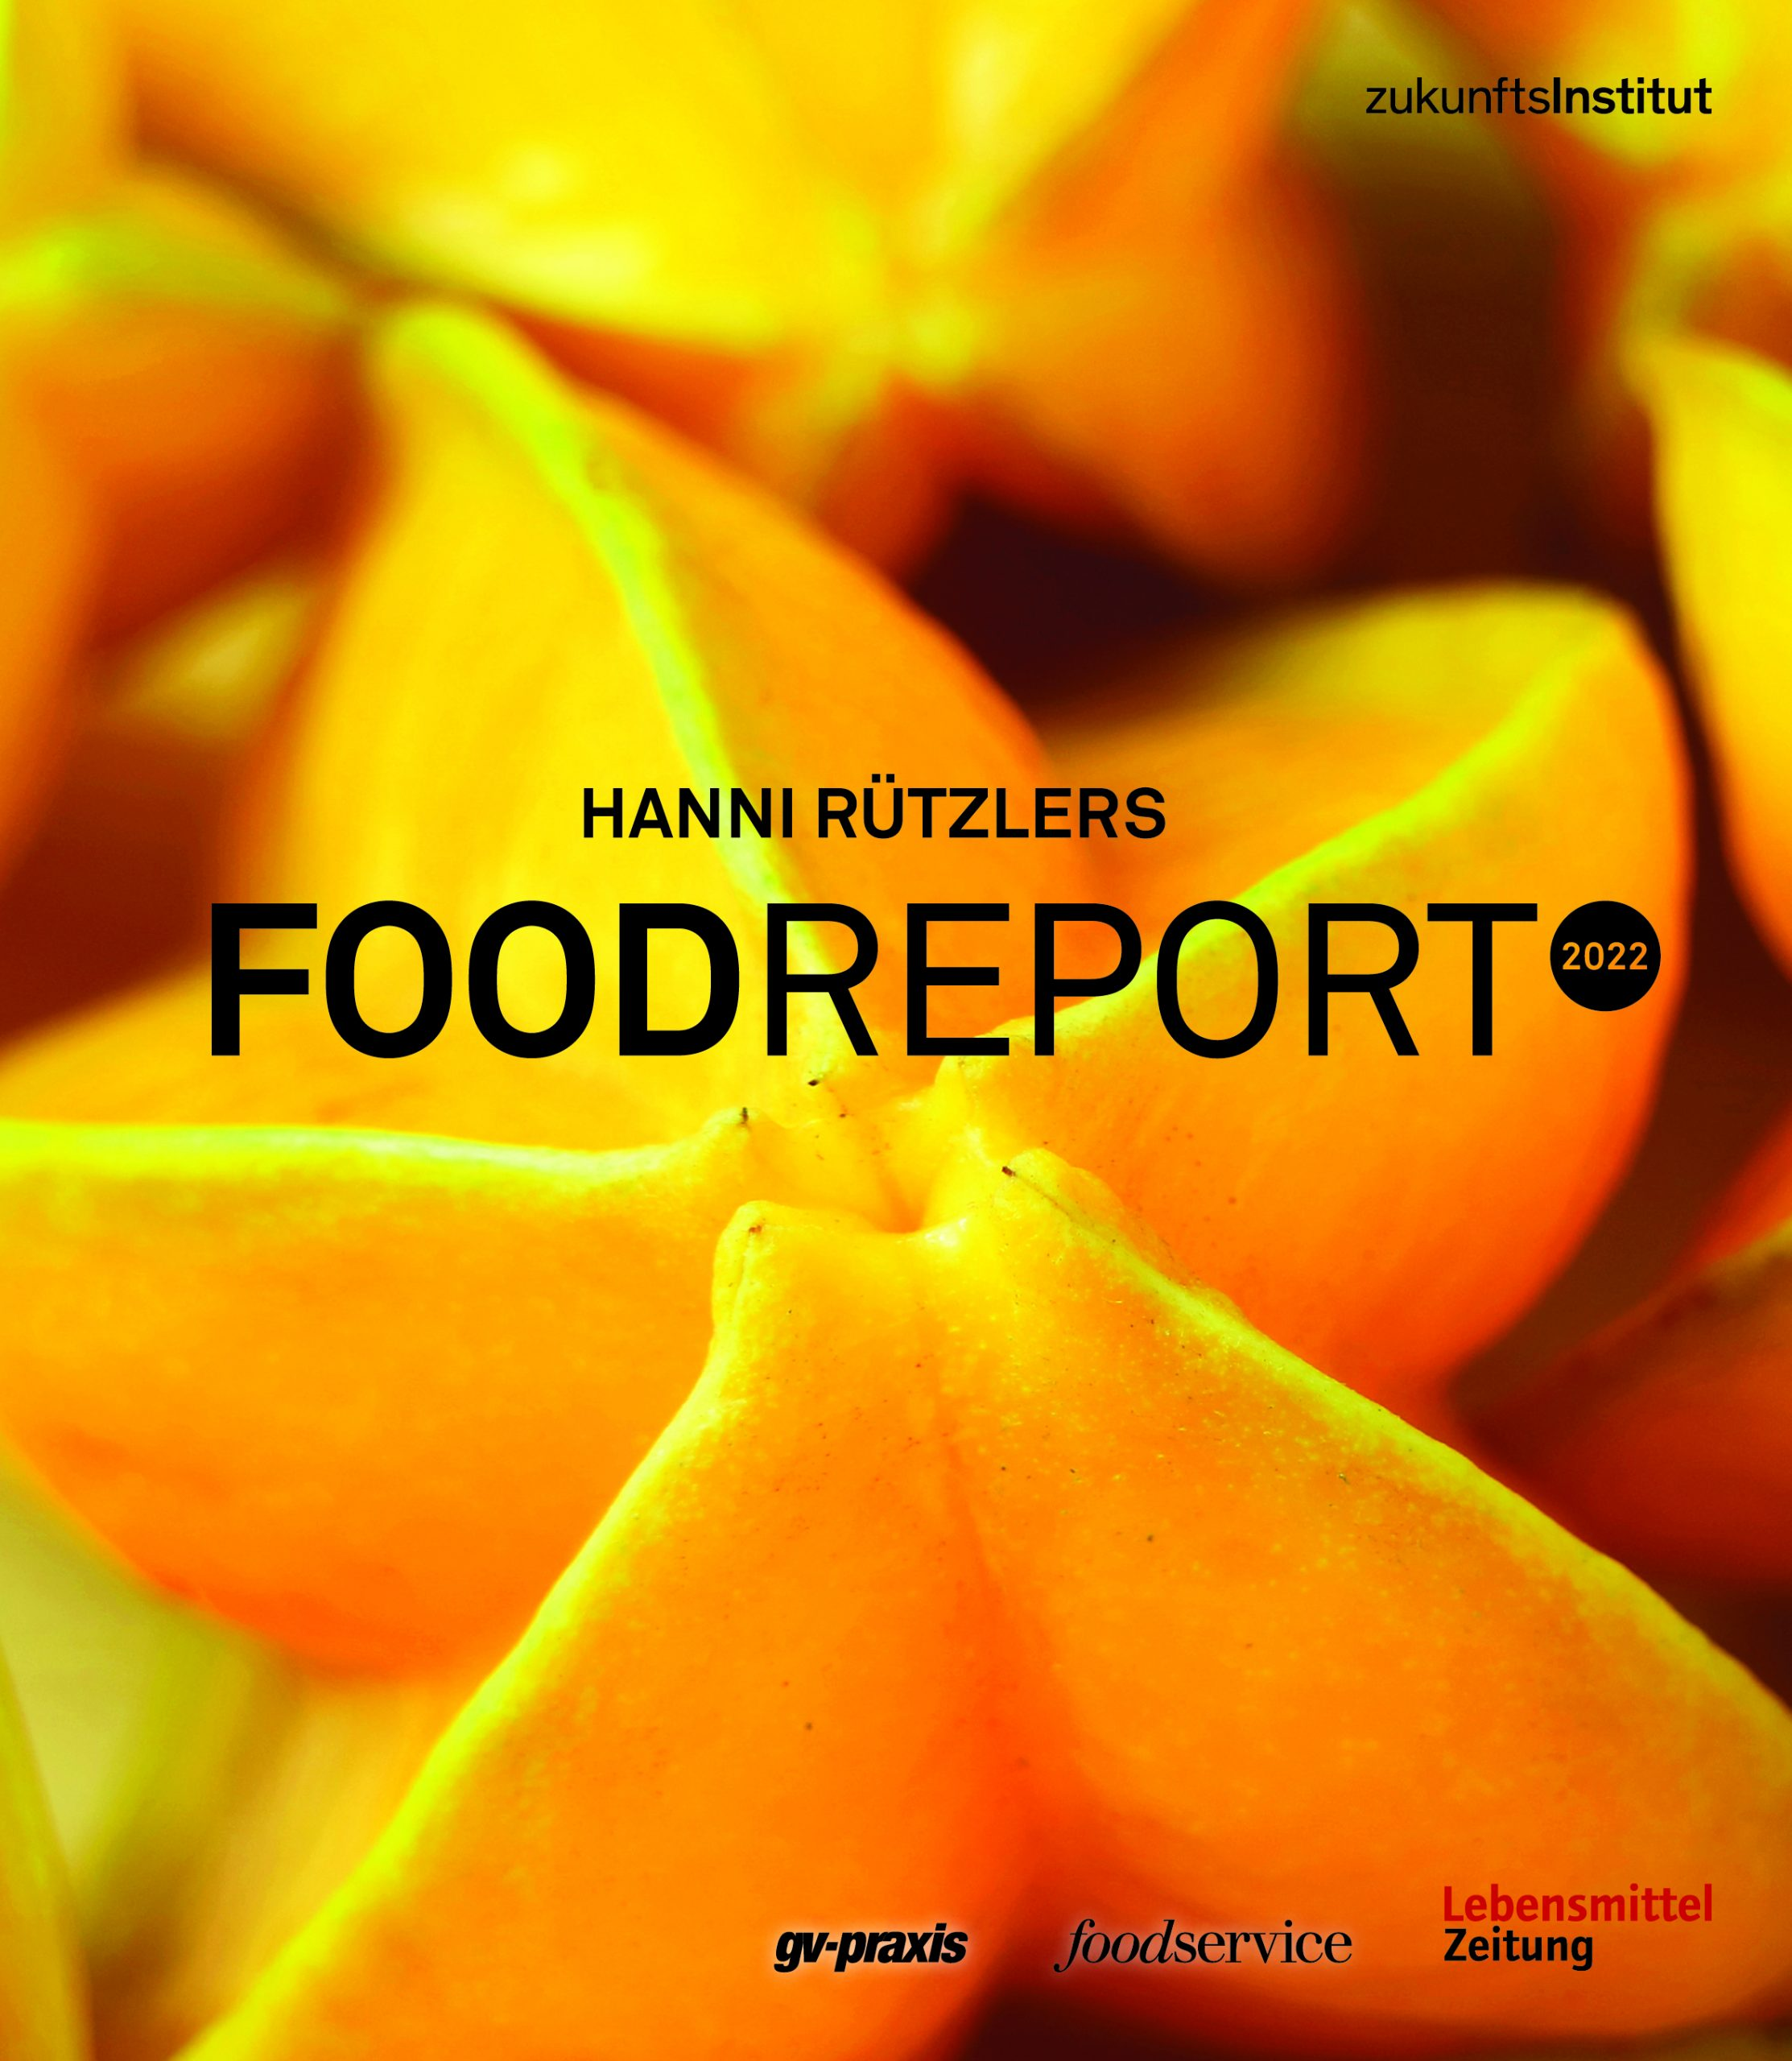 Hanni Rützlers FOOD REPORT 2022